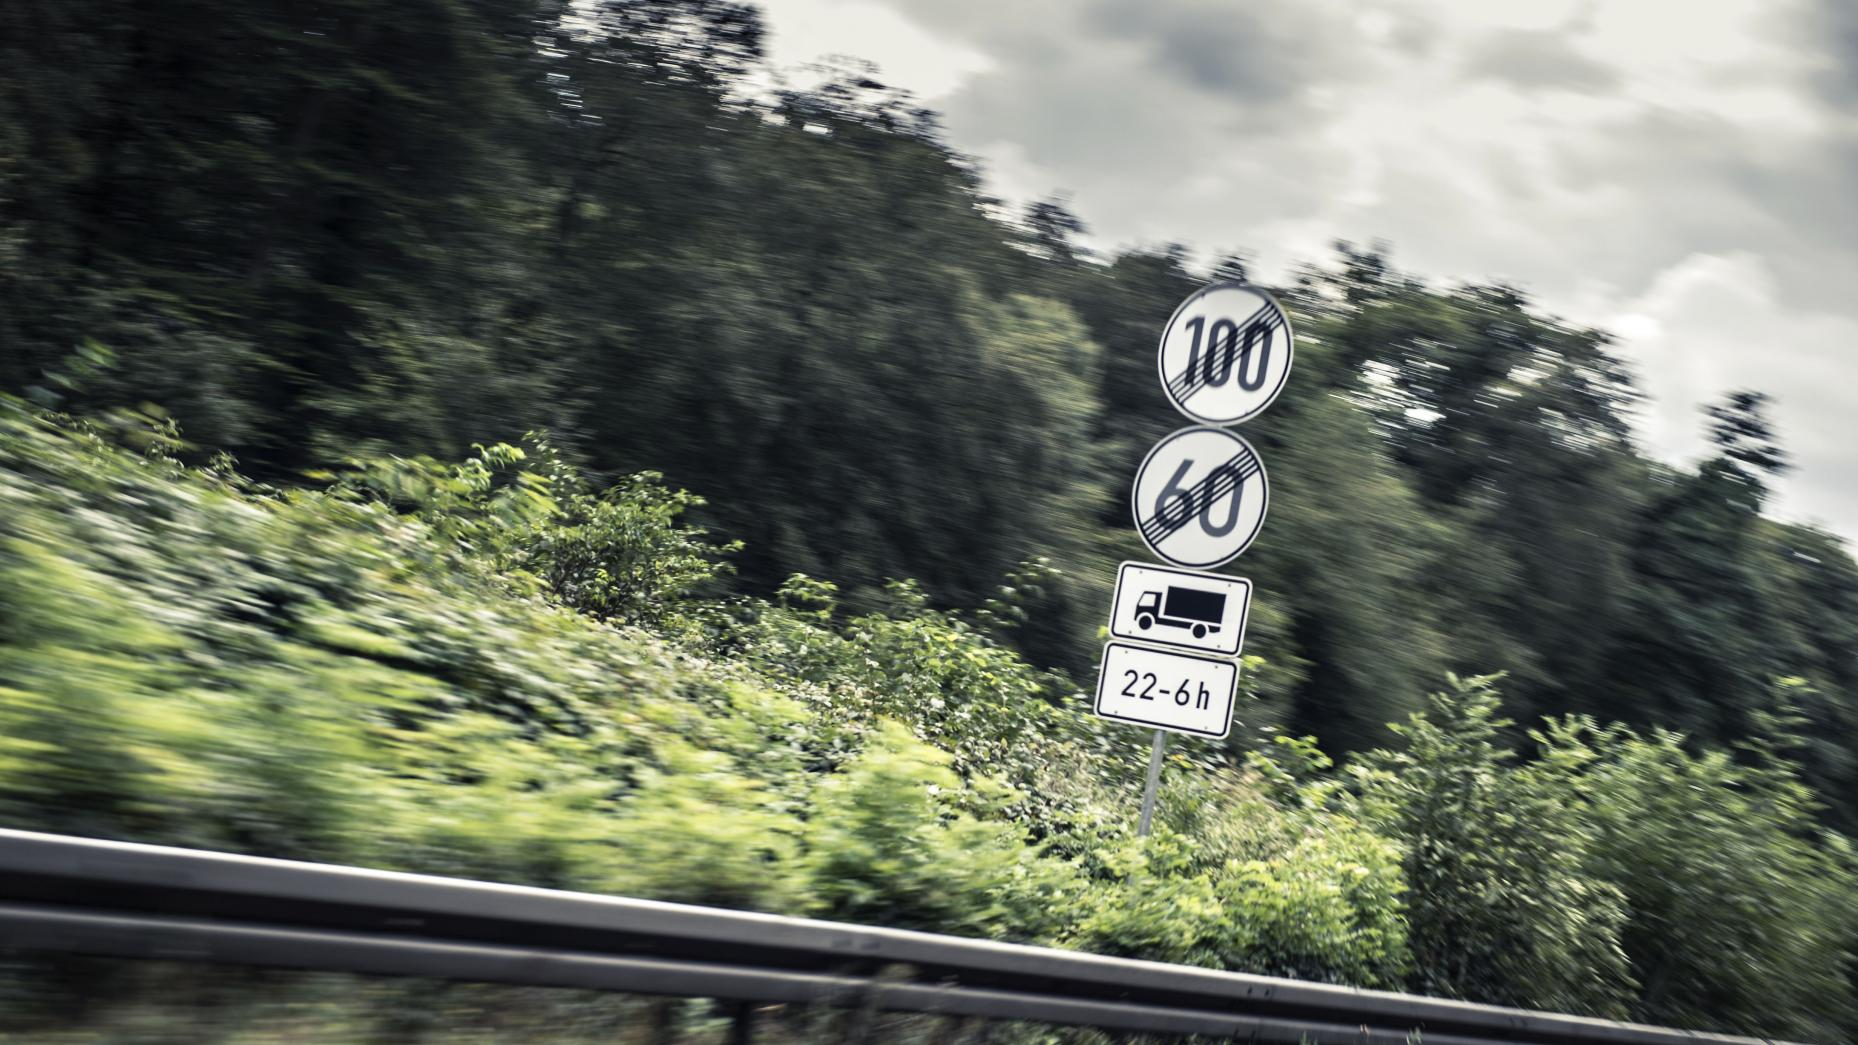 maximumsnelheid in duitsland